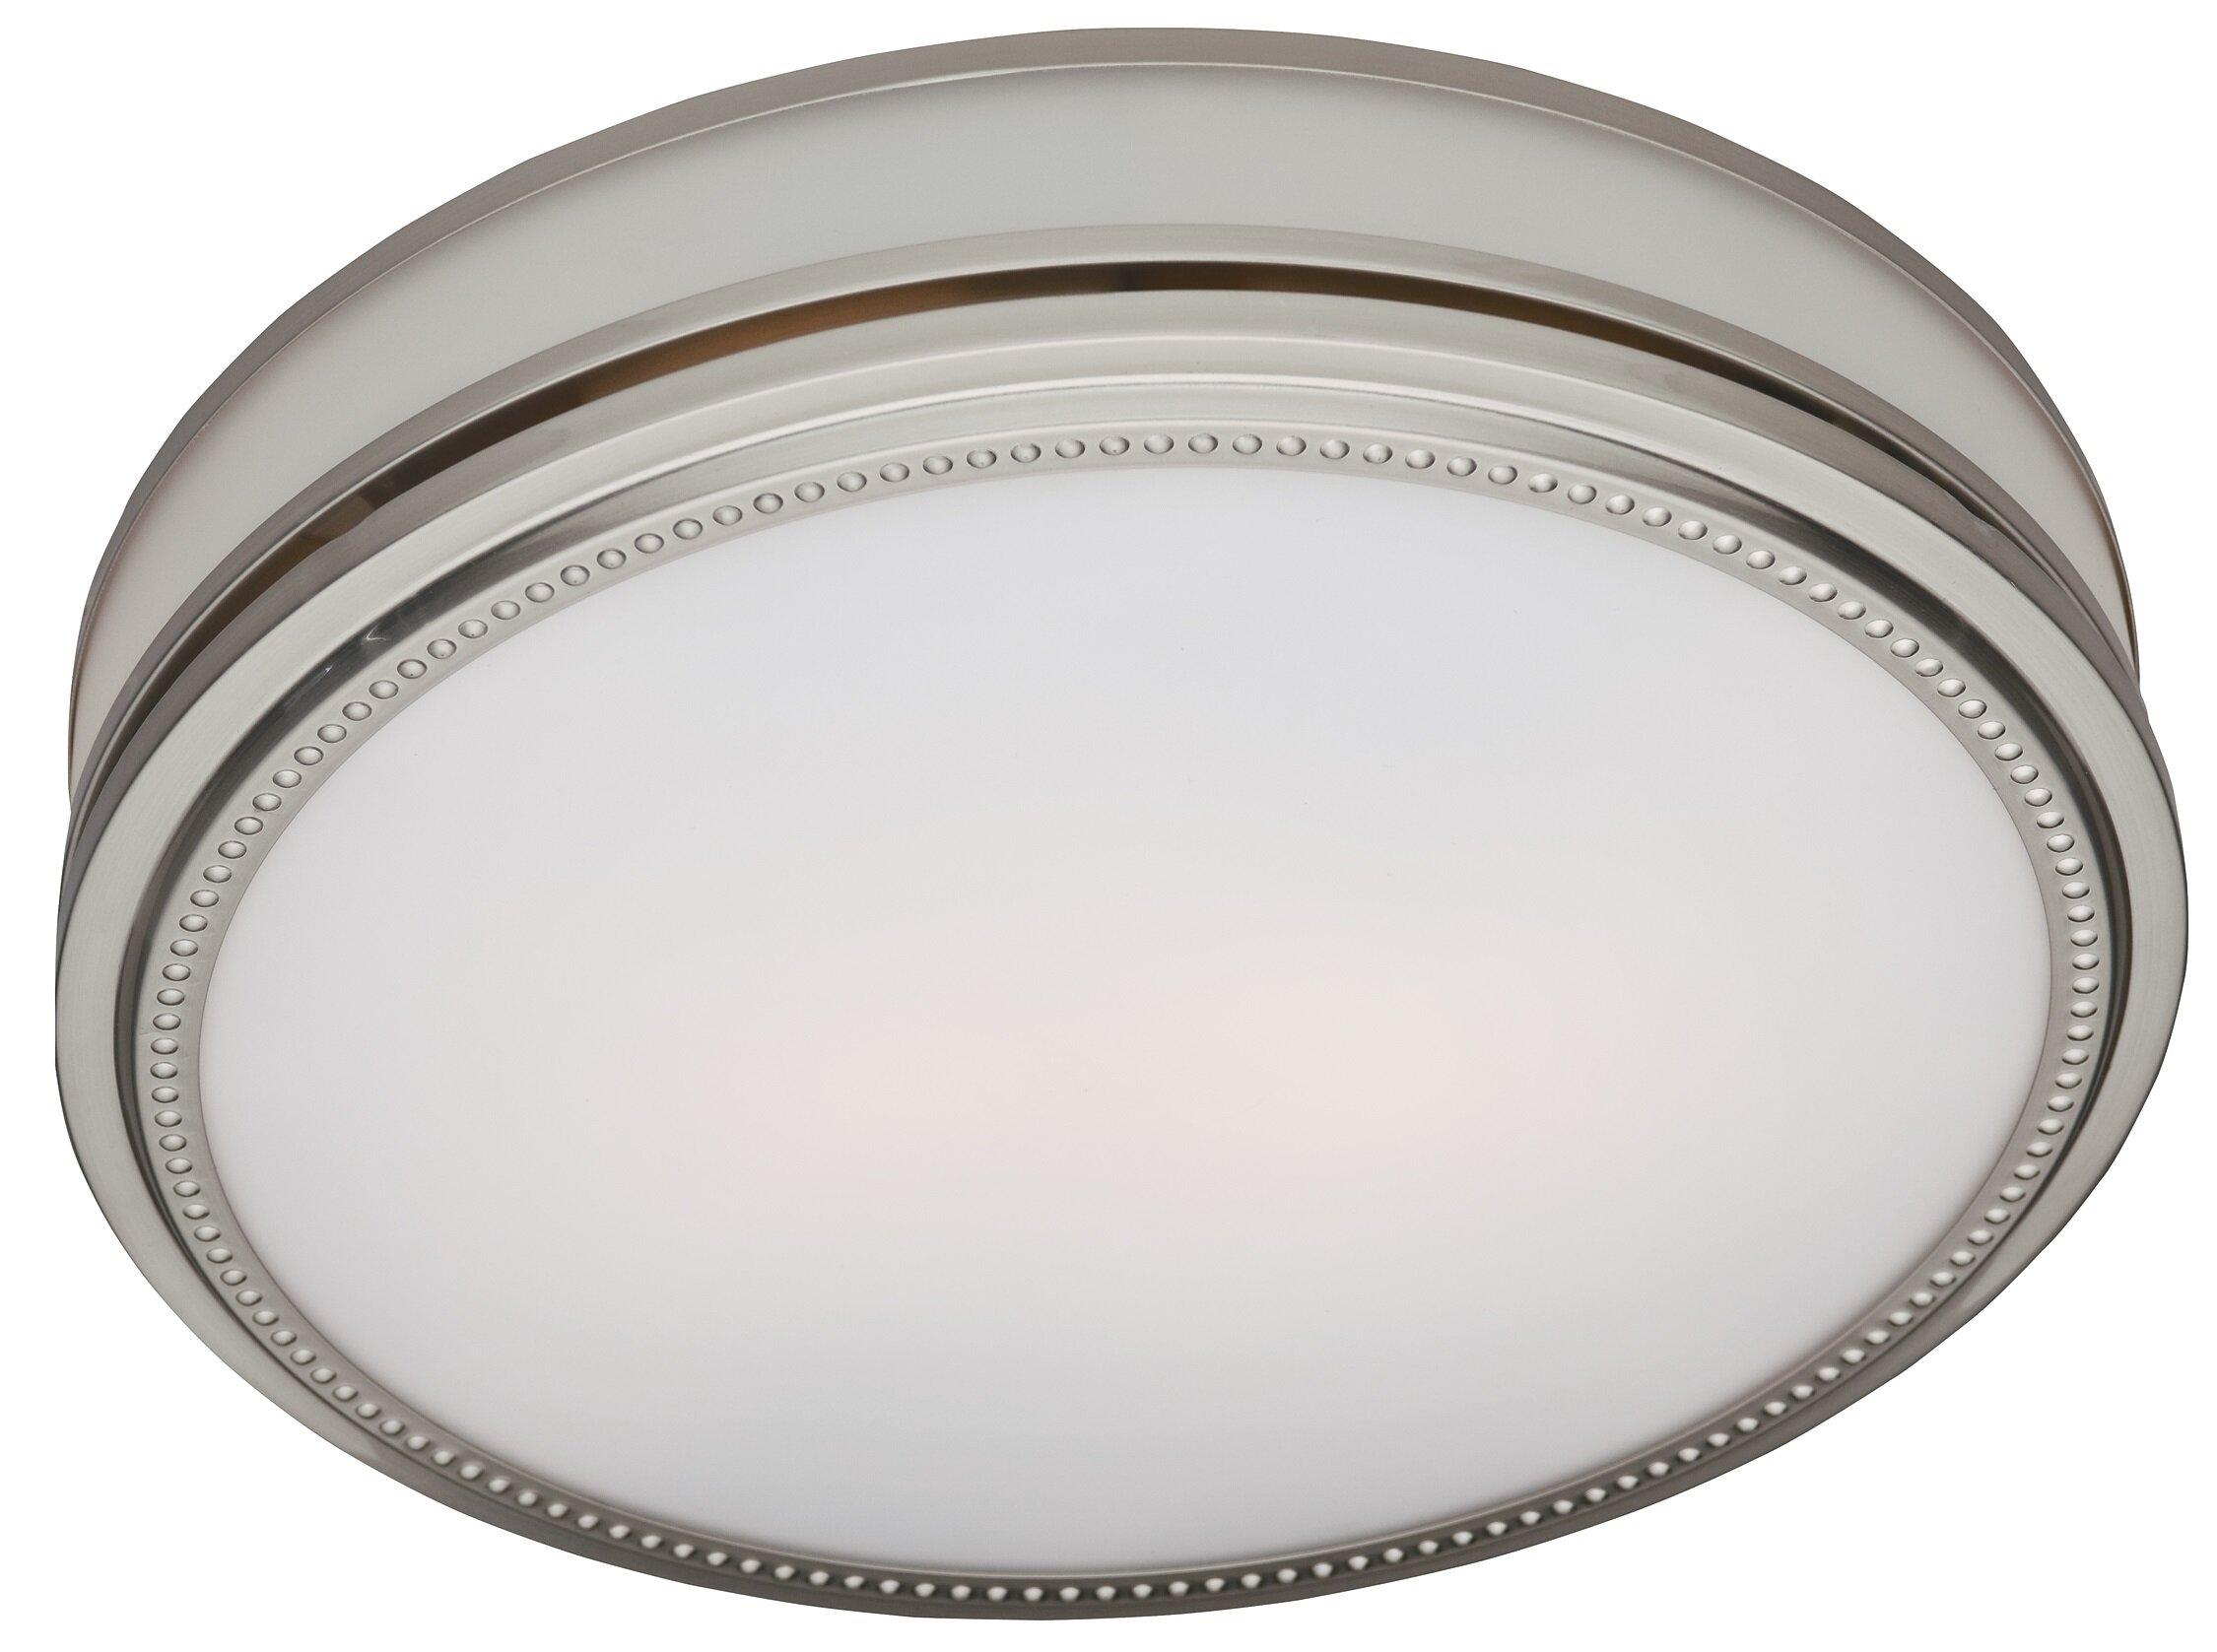 Hunter Home Environment 110 Cfm Riazzi Bathroom Exhaust Fan With Light Reviews Wayfair